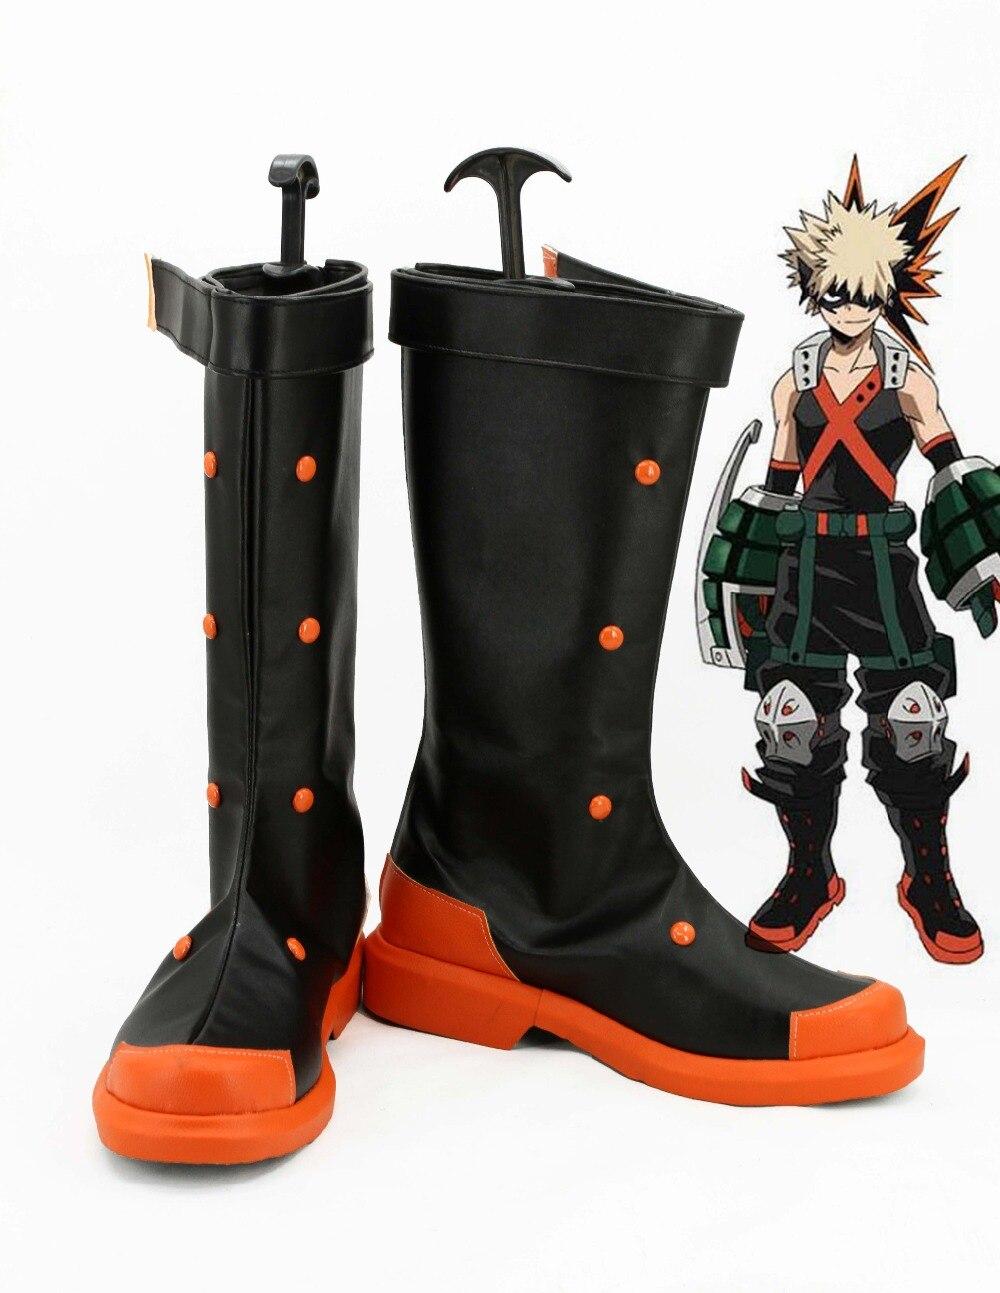 Boku no Hero Academia My Hero Academia Katsuki Bakugou Cosplay Shoes Anime boots Custom made